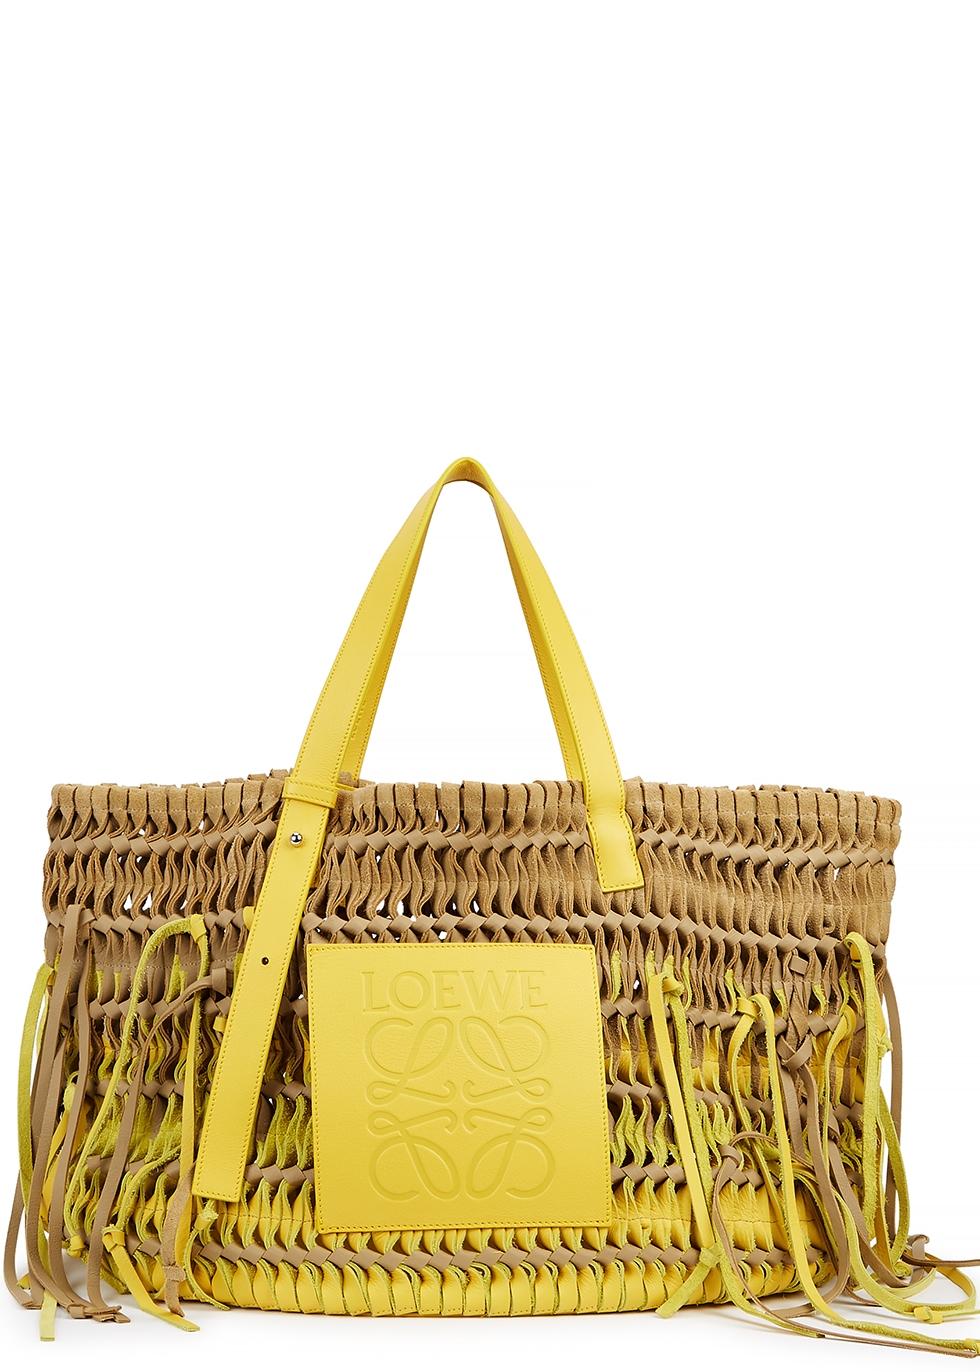 905270413600 Women s Designer Bags